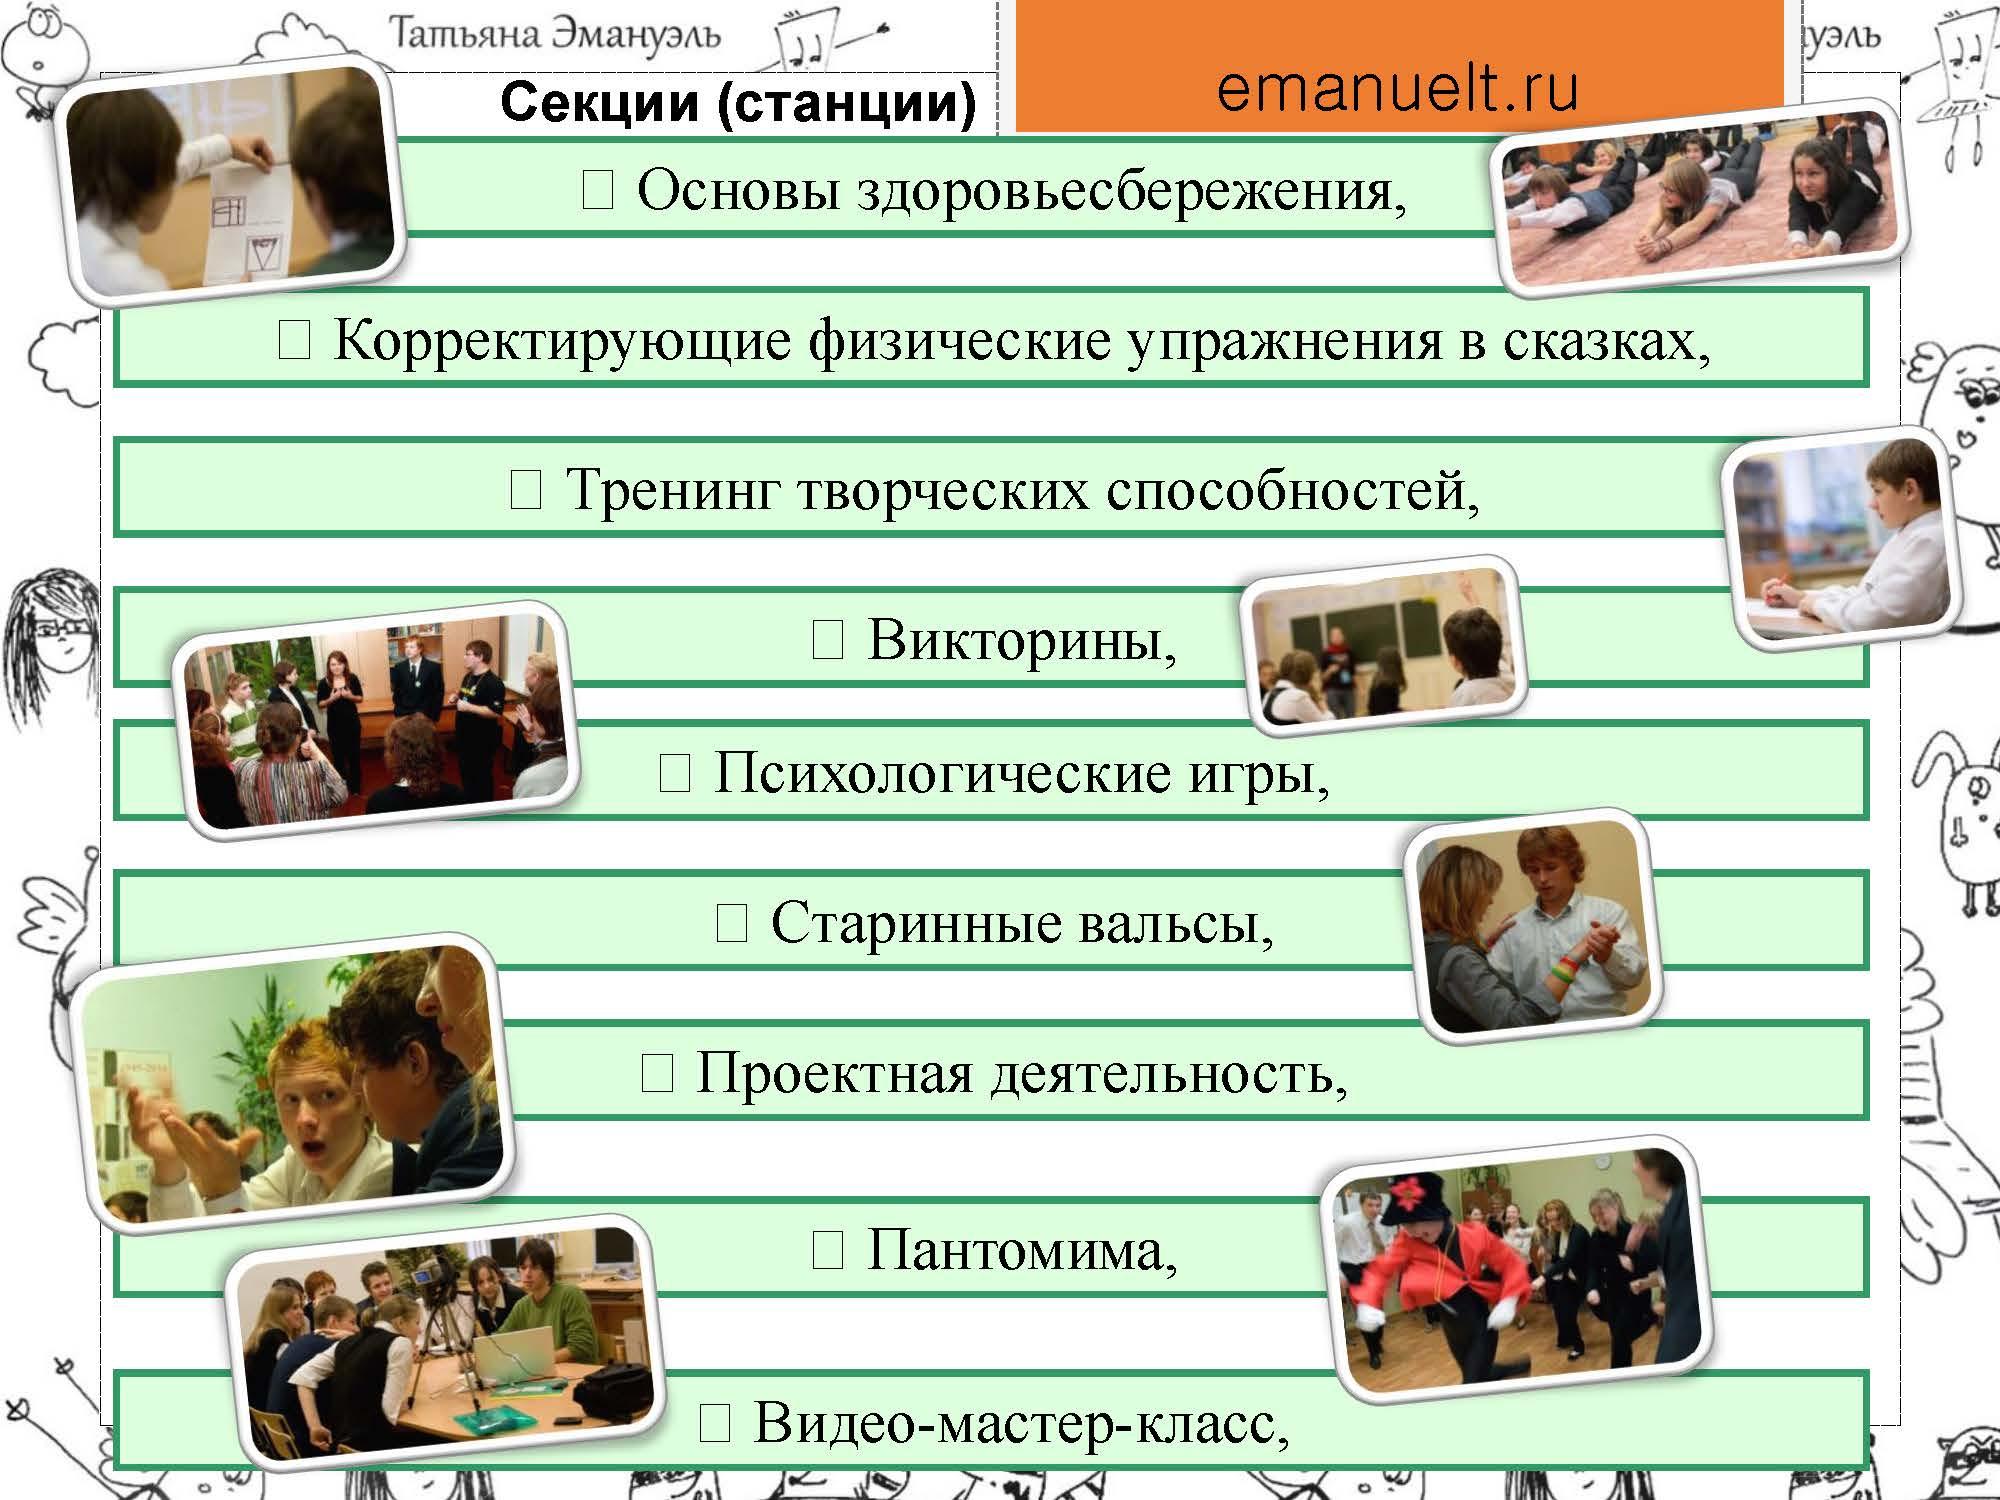 RazBeG_Emanuel_Страница_08